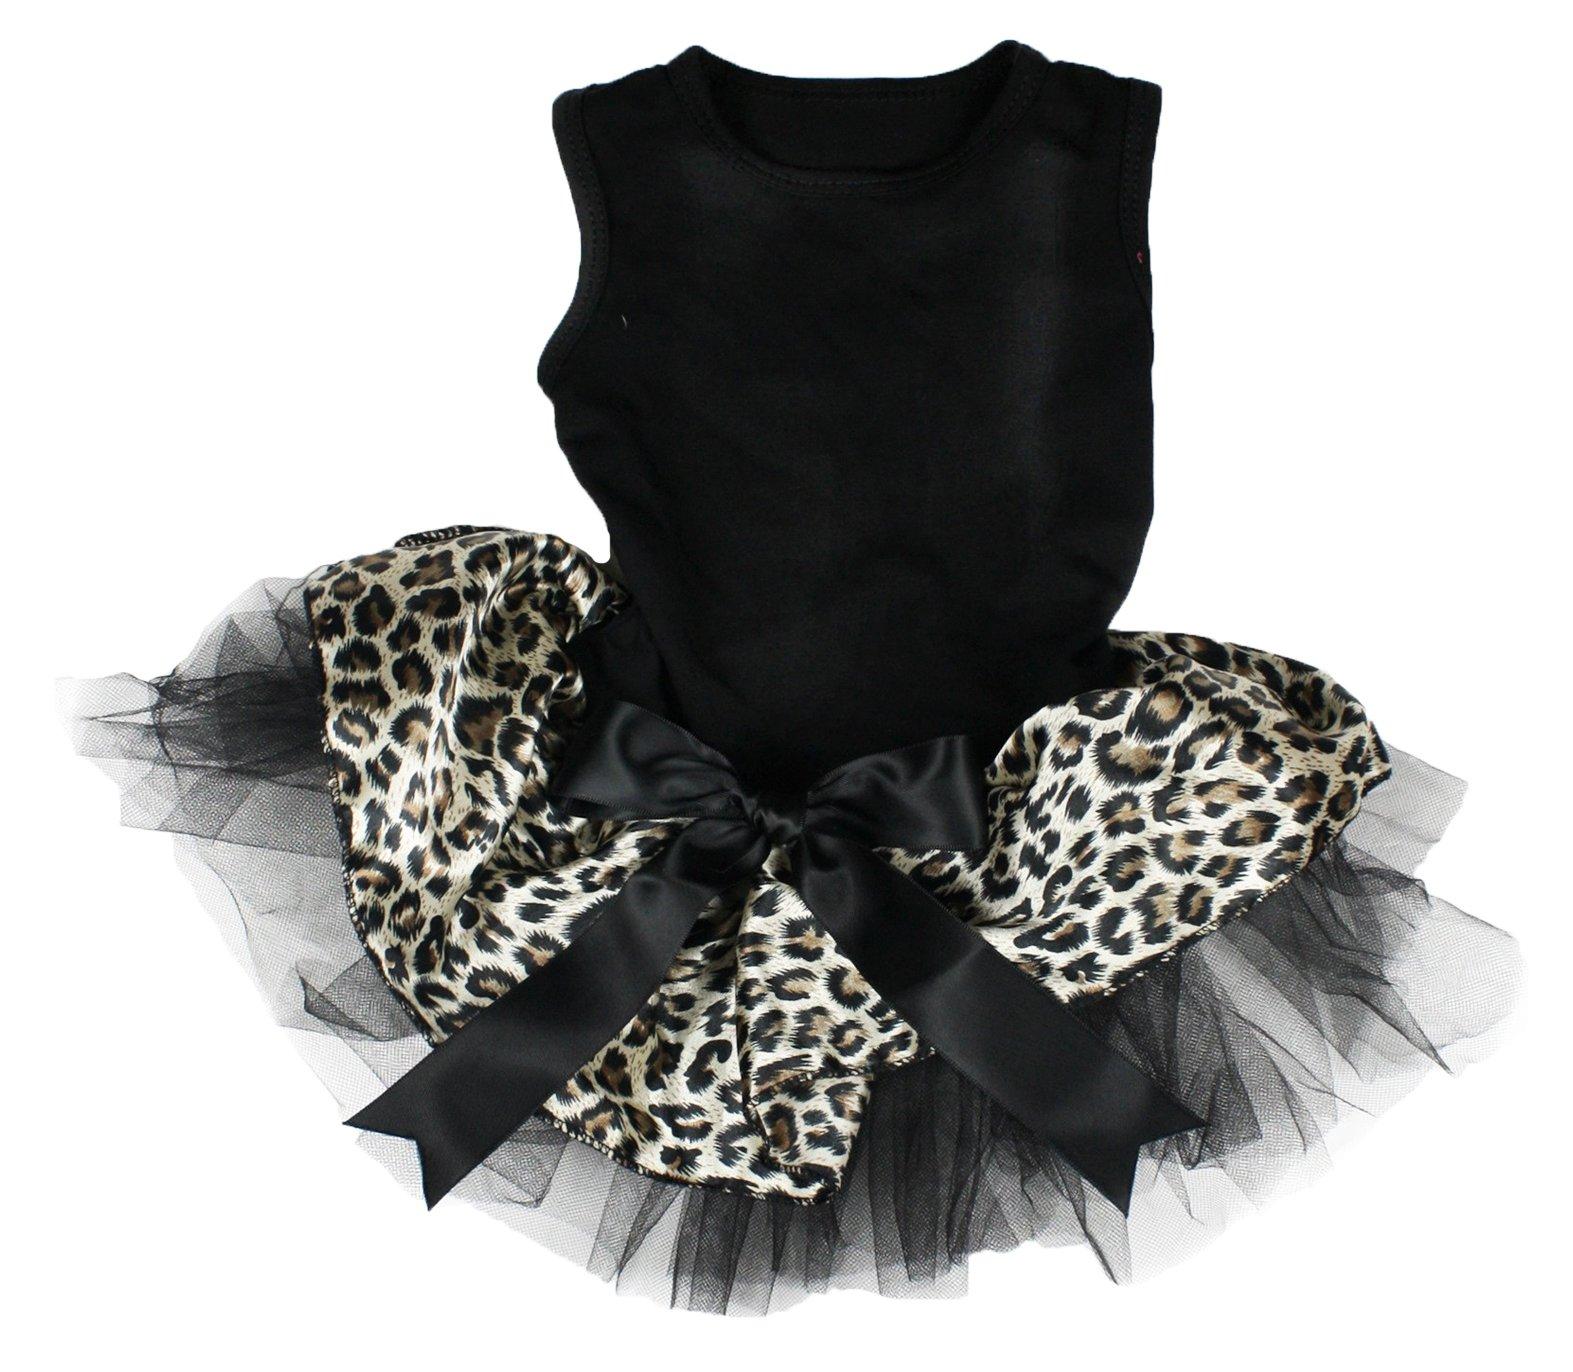 Petitebella Black Cotton Shirt Leopard Tutu Puppy Dog Dress (Large)